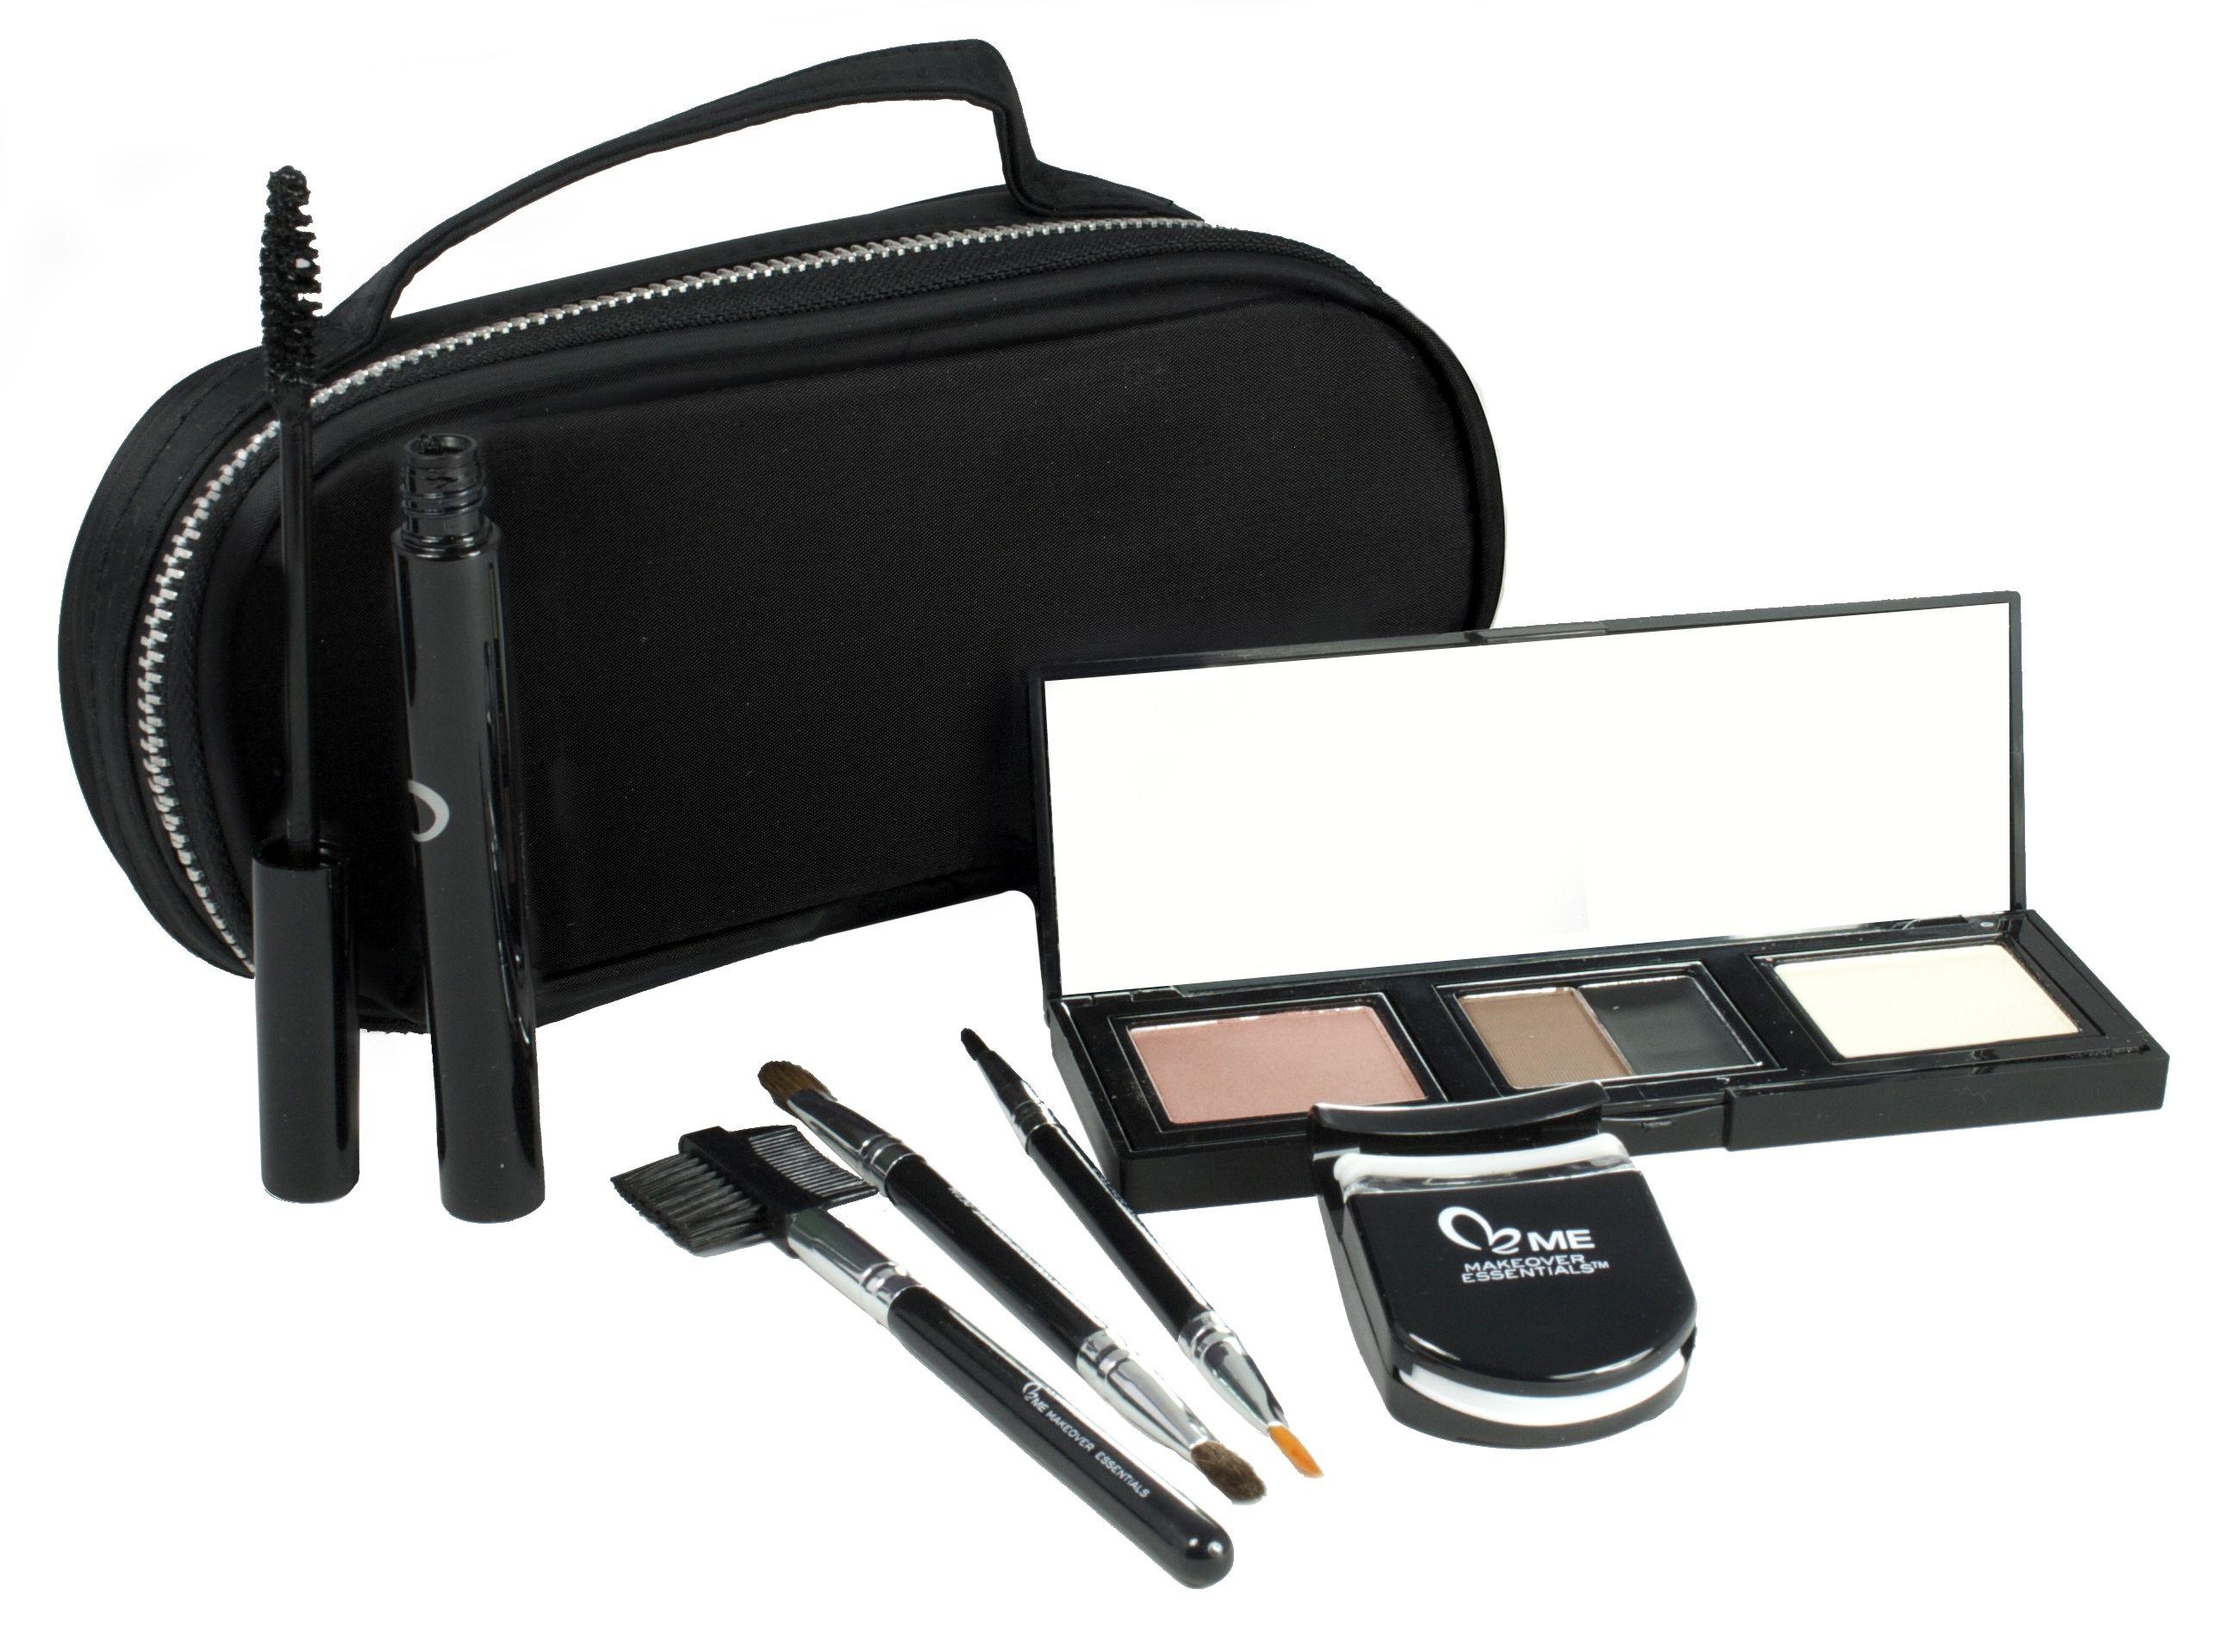 Makeover Essentials Me Kits Makeover Essentials Makeover Essentials Makeover Cosmetics